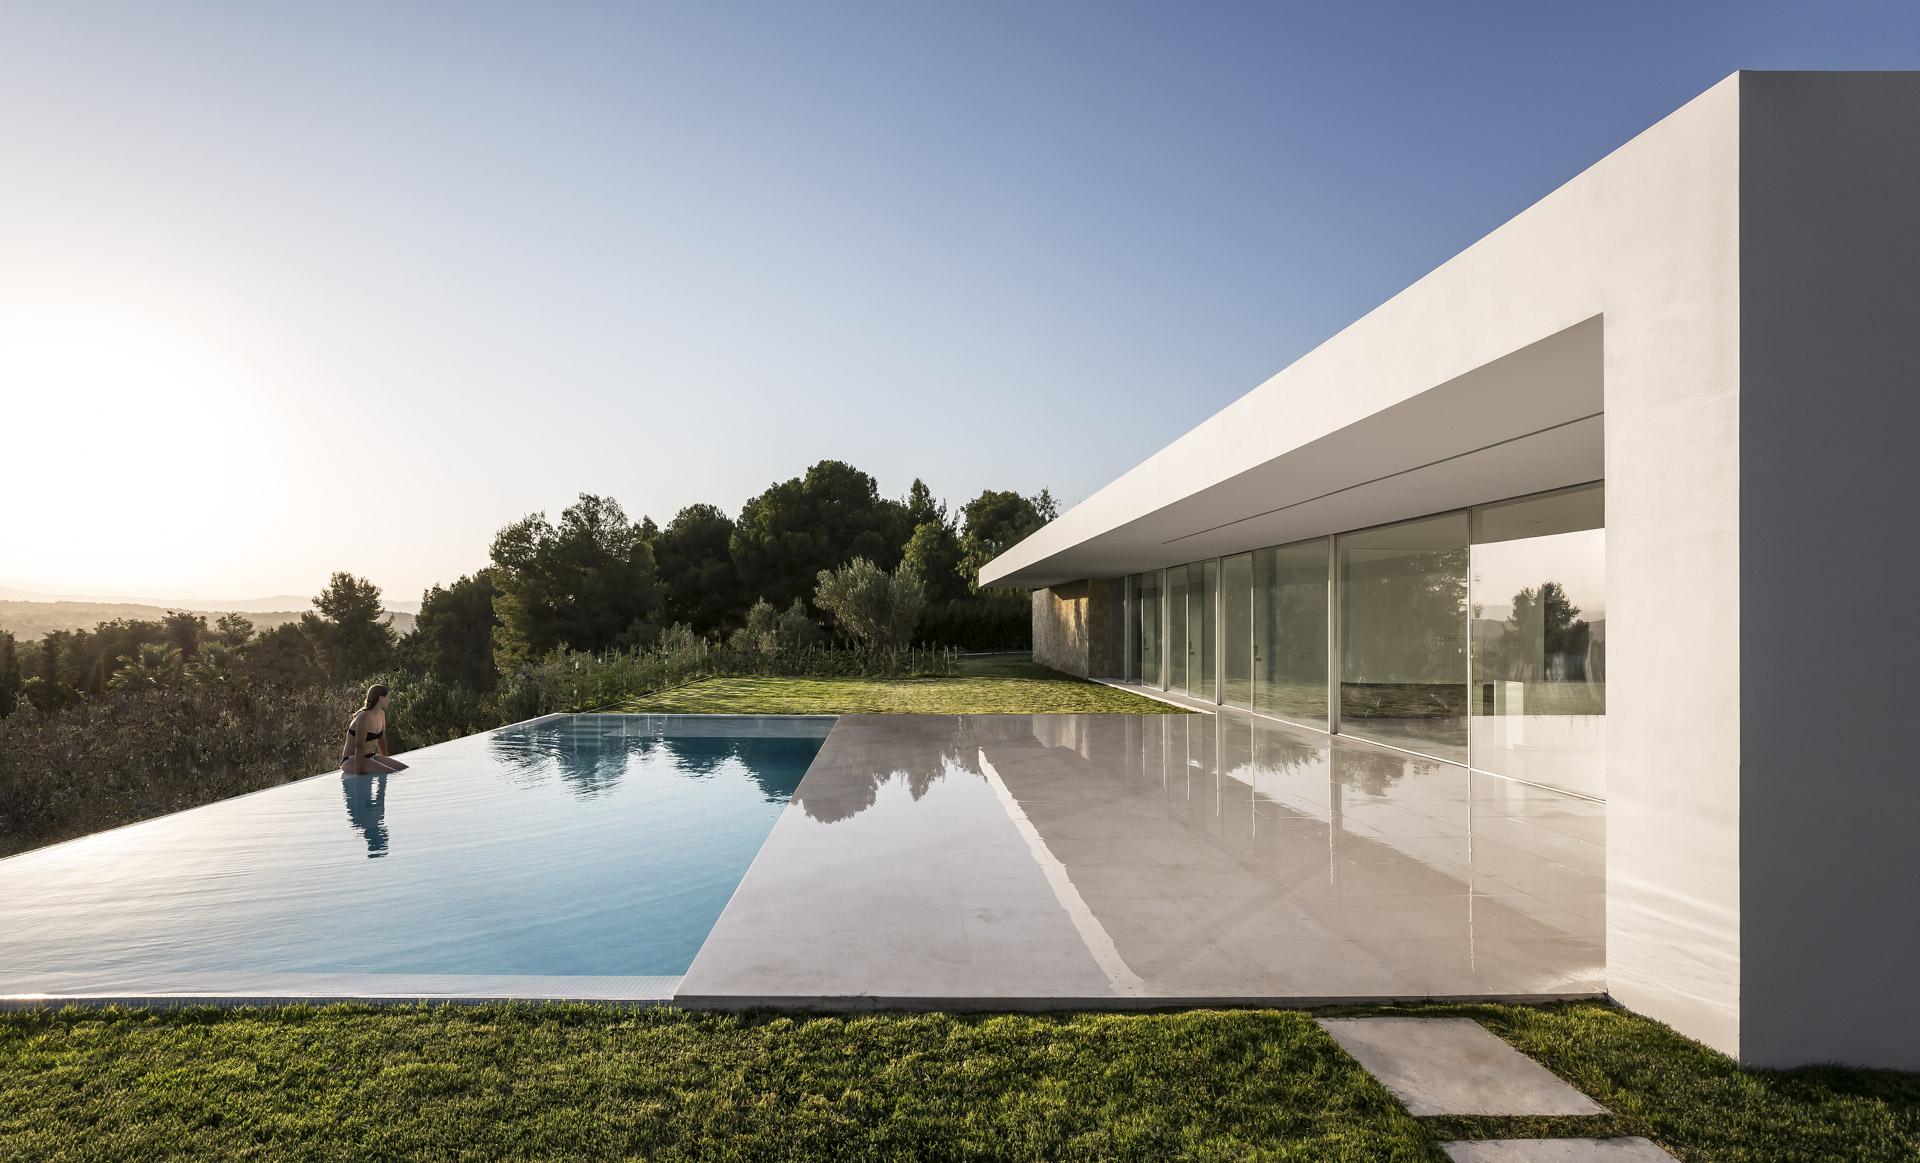 fotografia-arquitectura-valencia-german-cabo-gallardo-llopis-villamarchante-vivienda-46